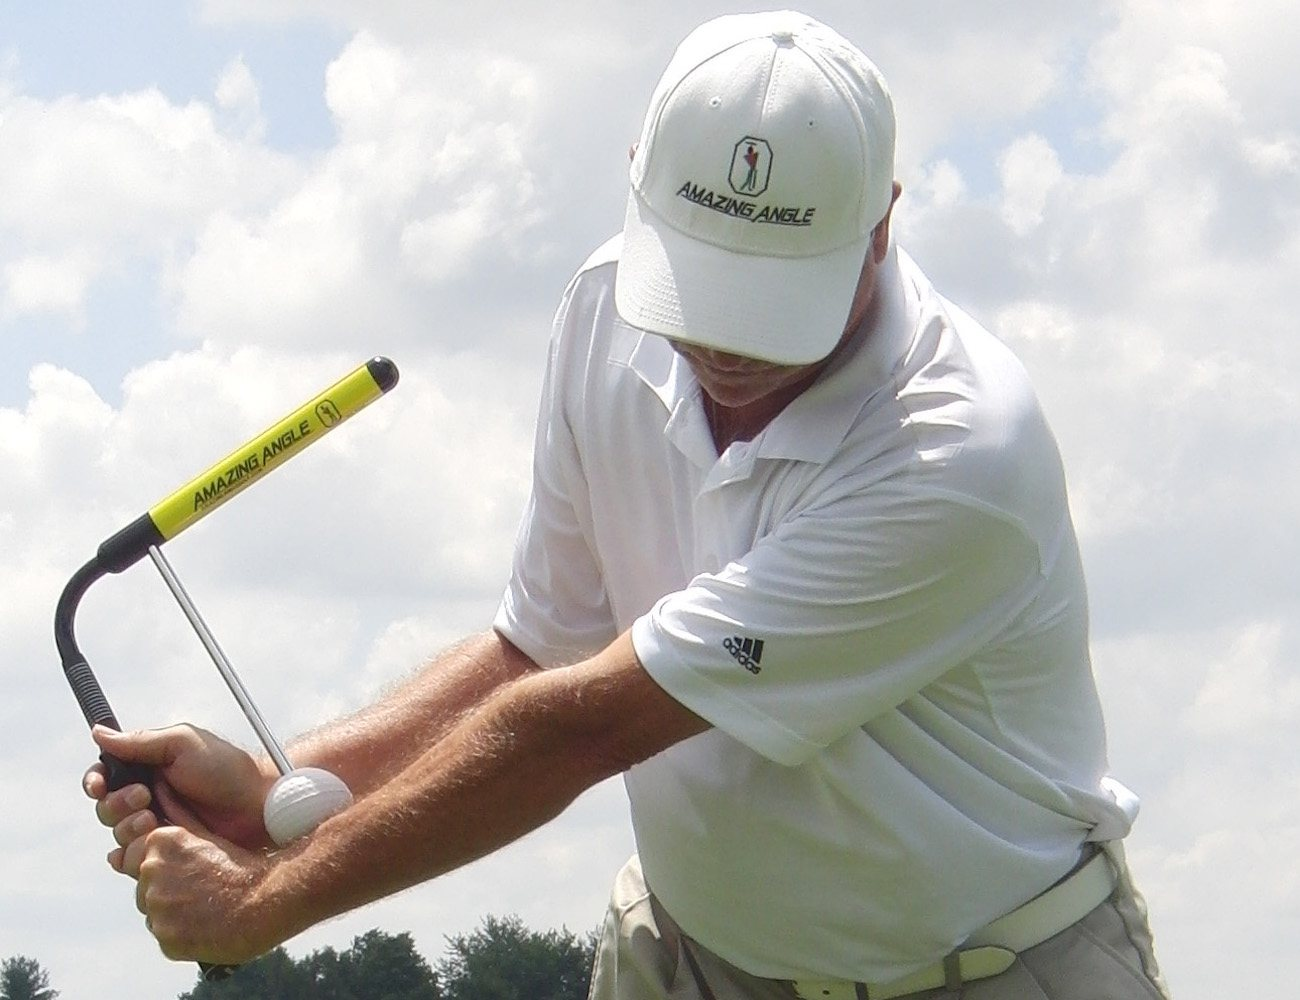 Amazing Angle Golf Swing Training Aid on Professional Teaching Portfolio